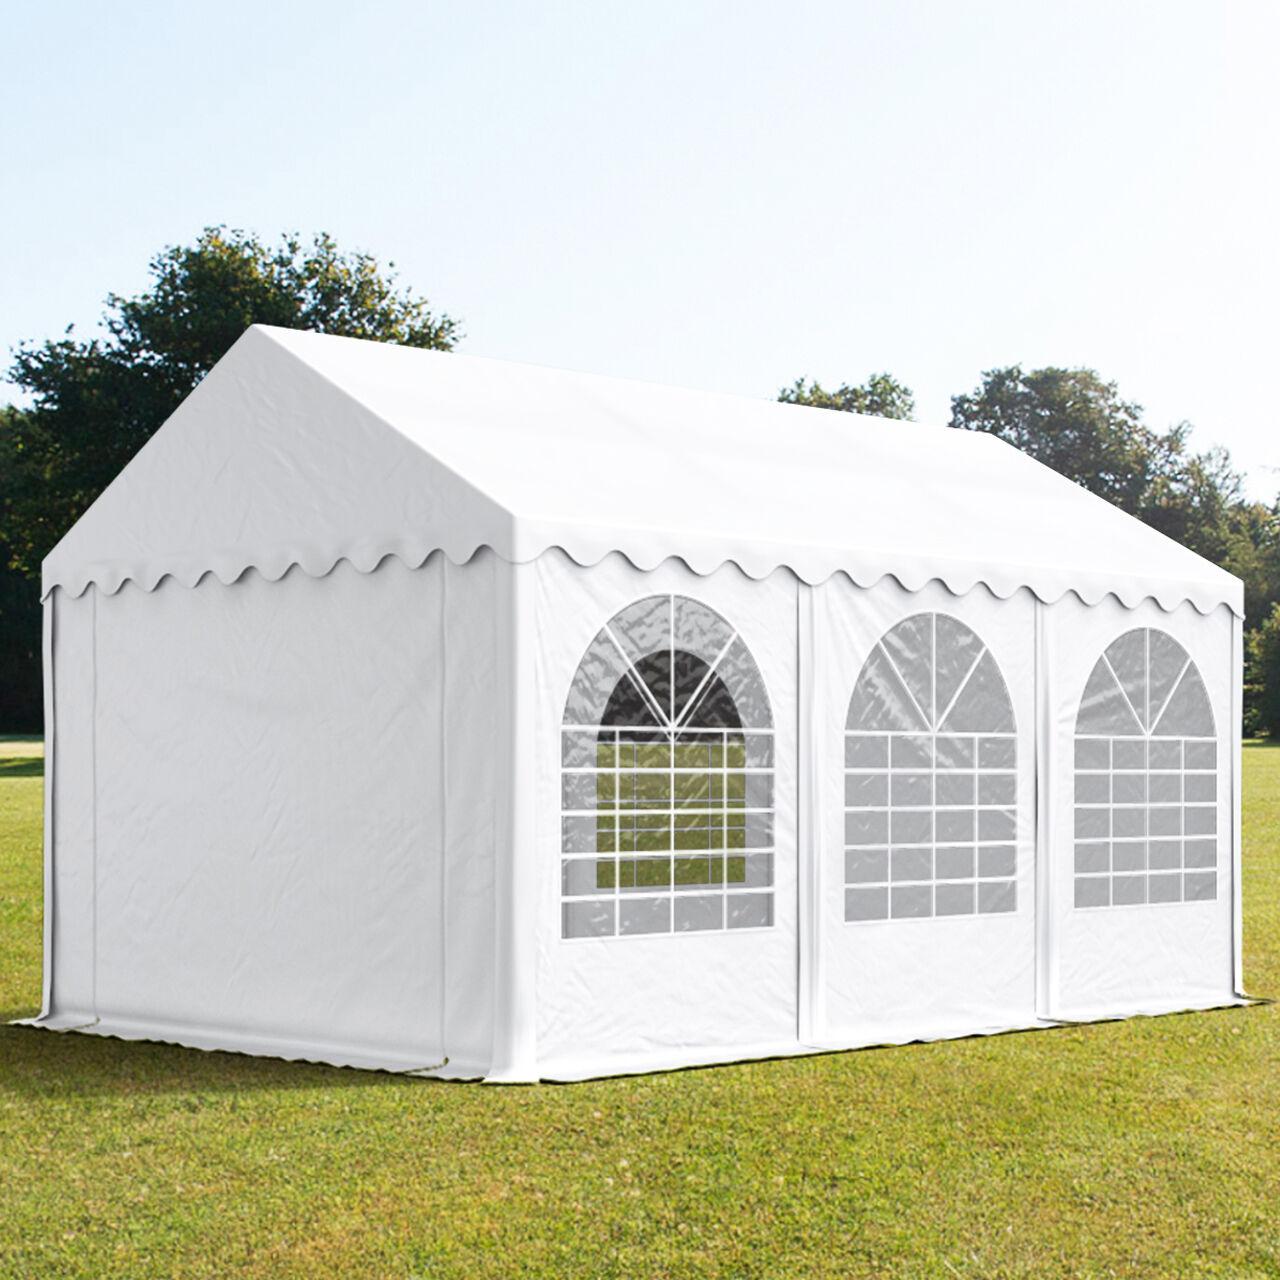 Toolport Tendone per Feste 3x6m PVC 550 g/m² bianco impermeabile